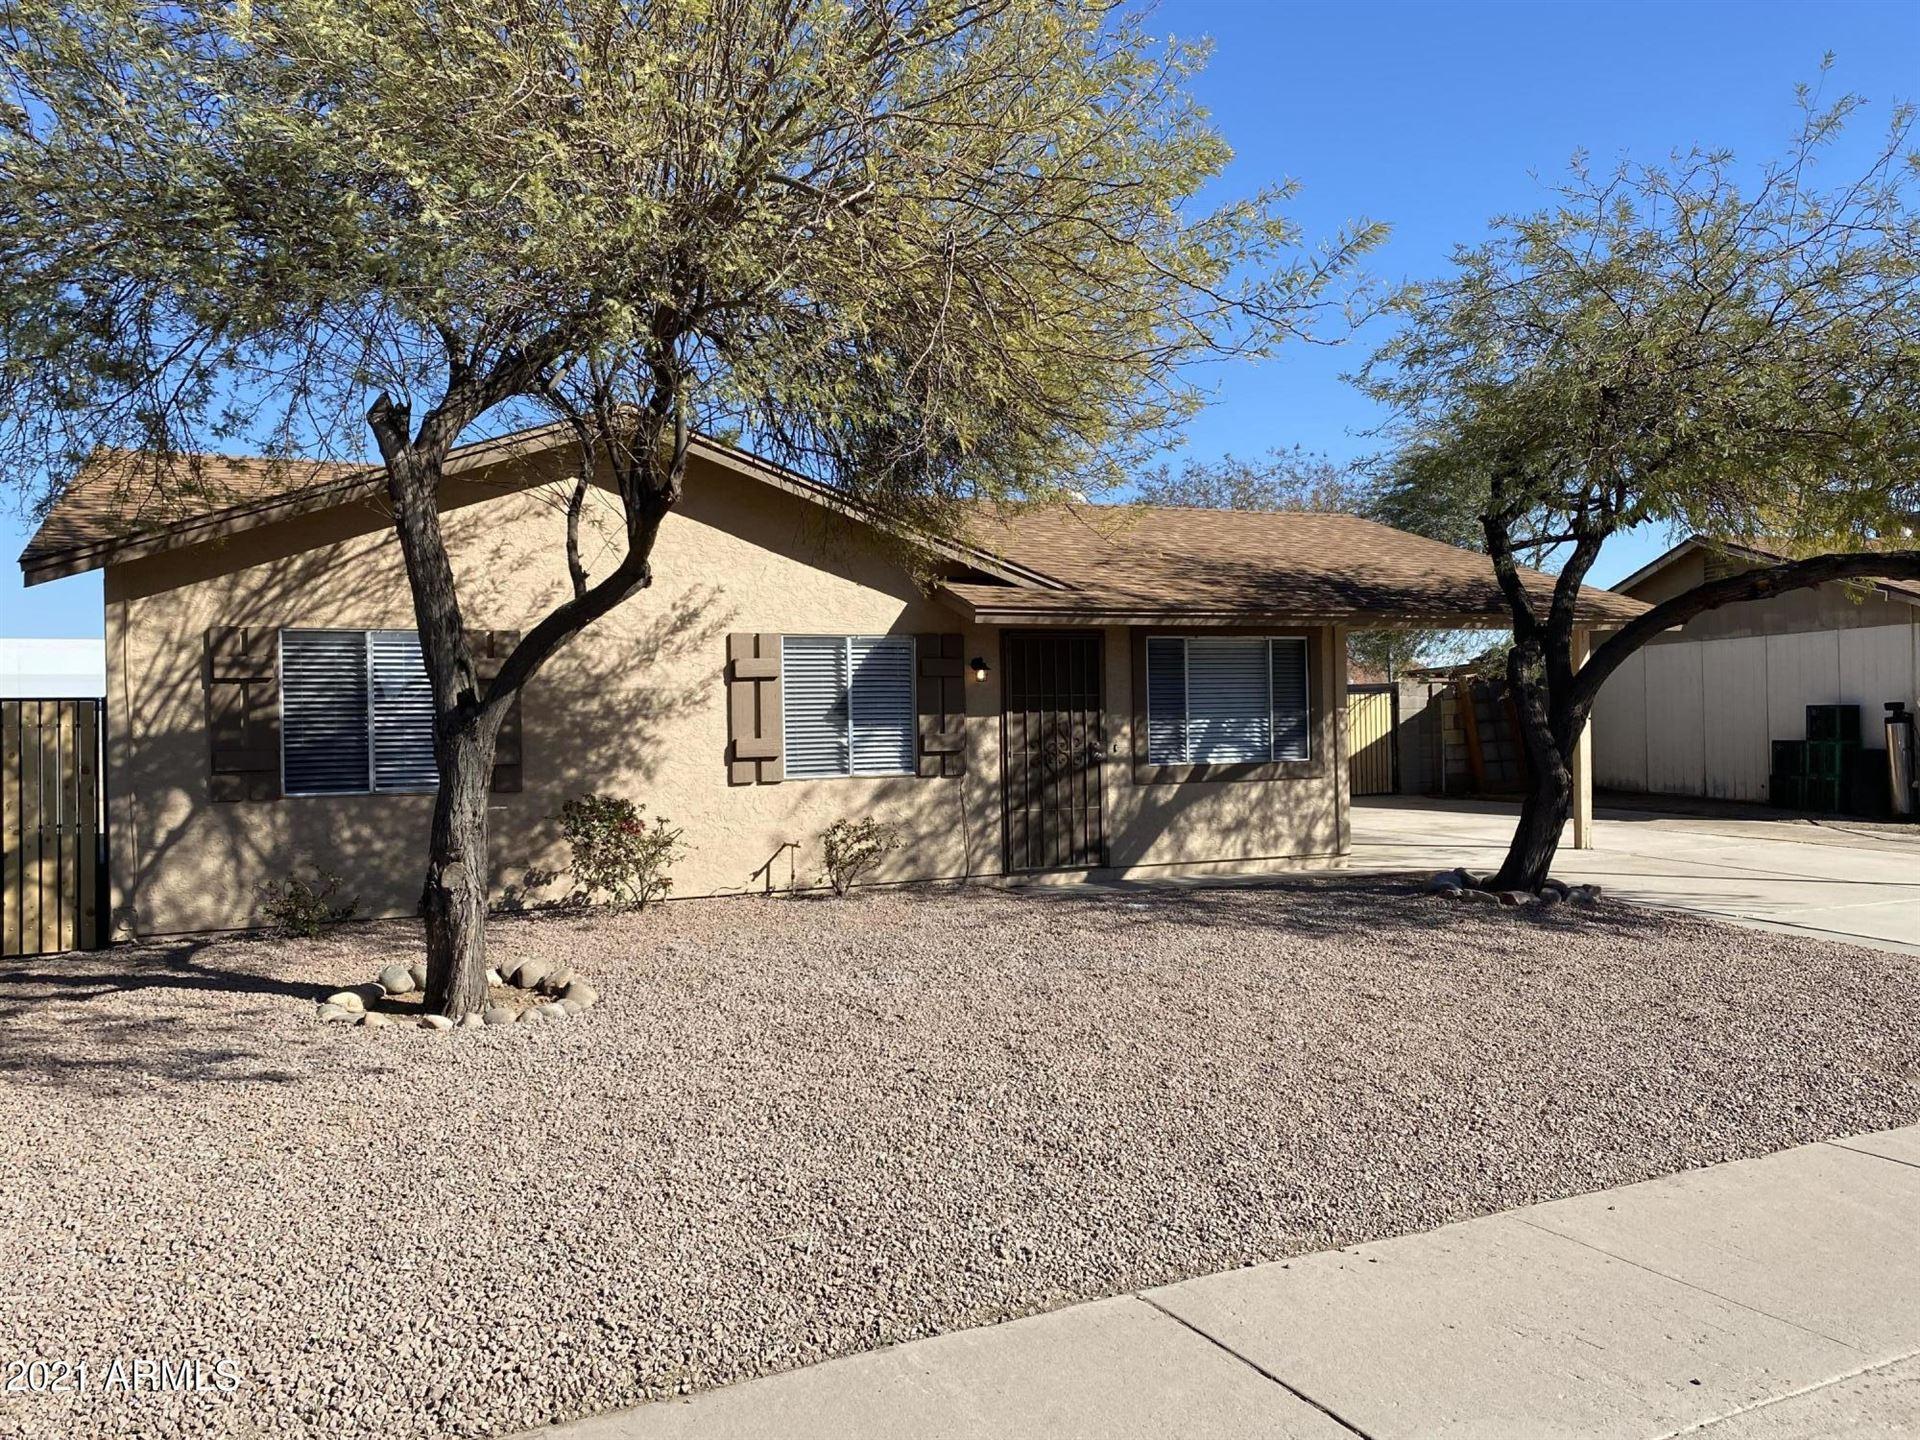 Photo of 329 N 69TH Avenue, Phoenix, AZ 85043 (MLS # 6200714)